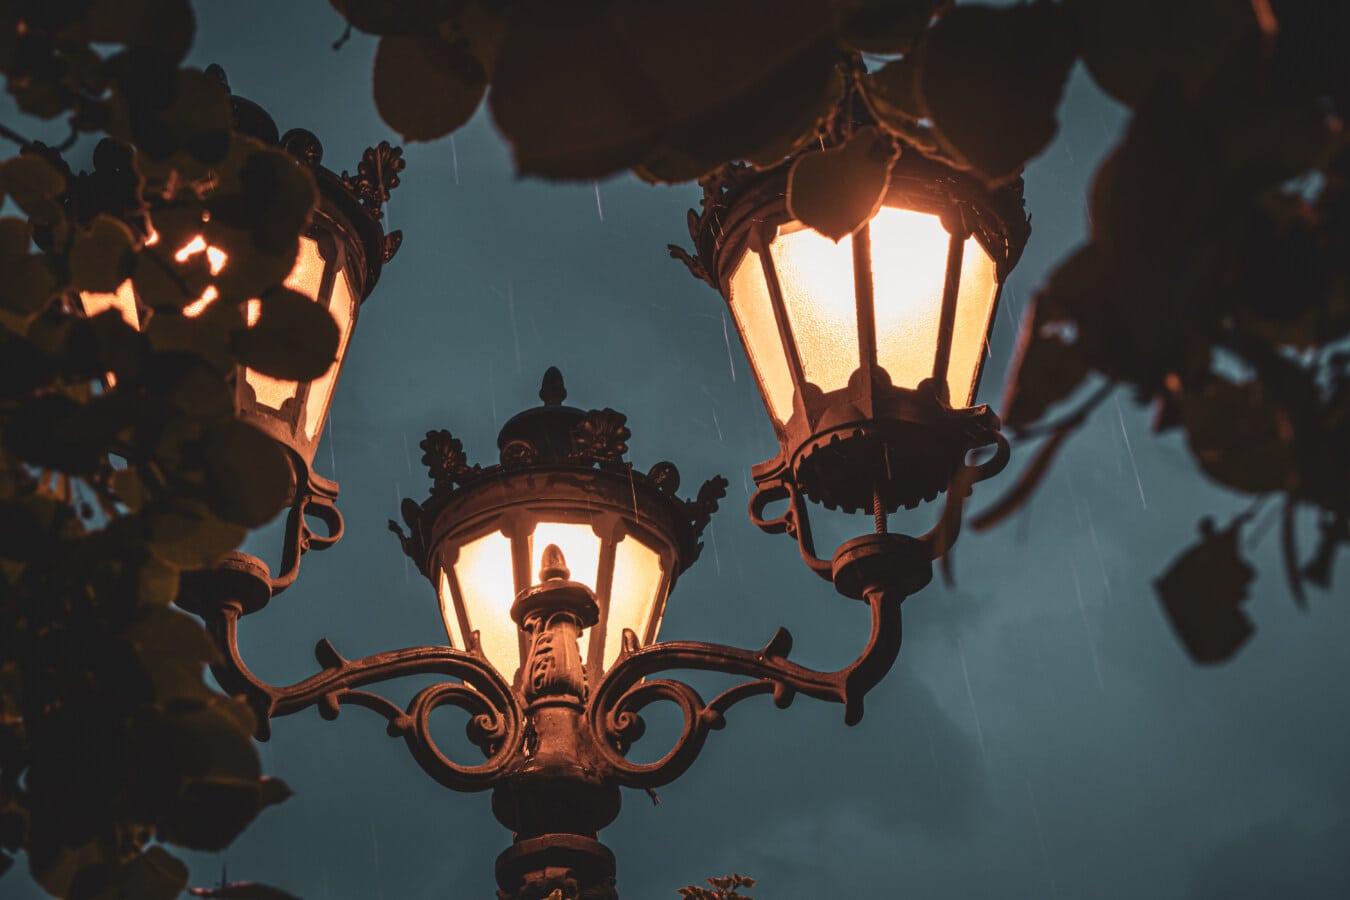 rain, lamp, cast iron, branches, lantern, retro, light, old, architecture, antique